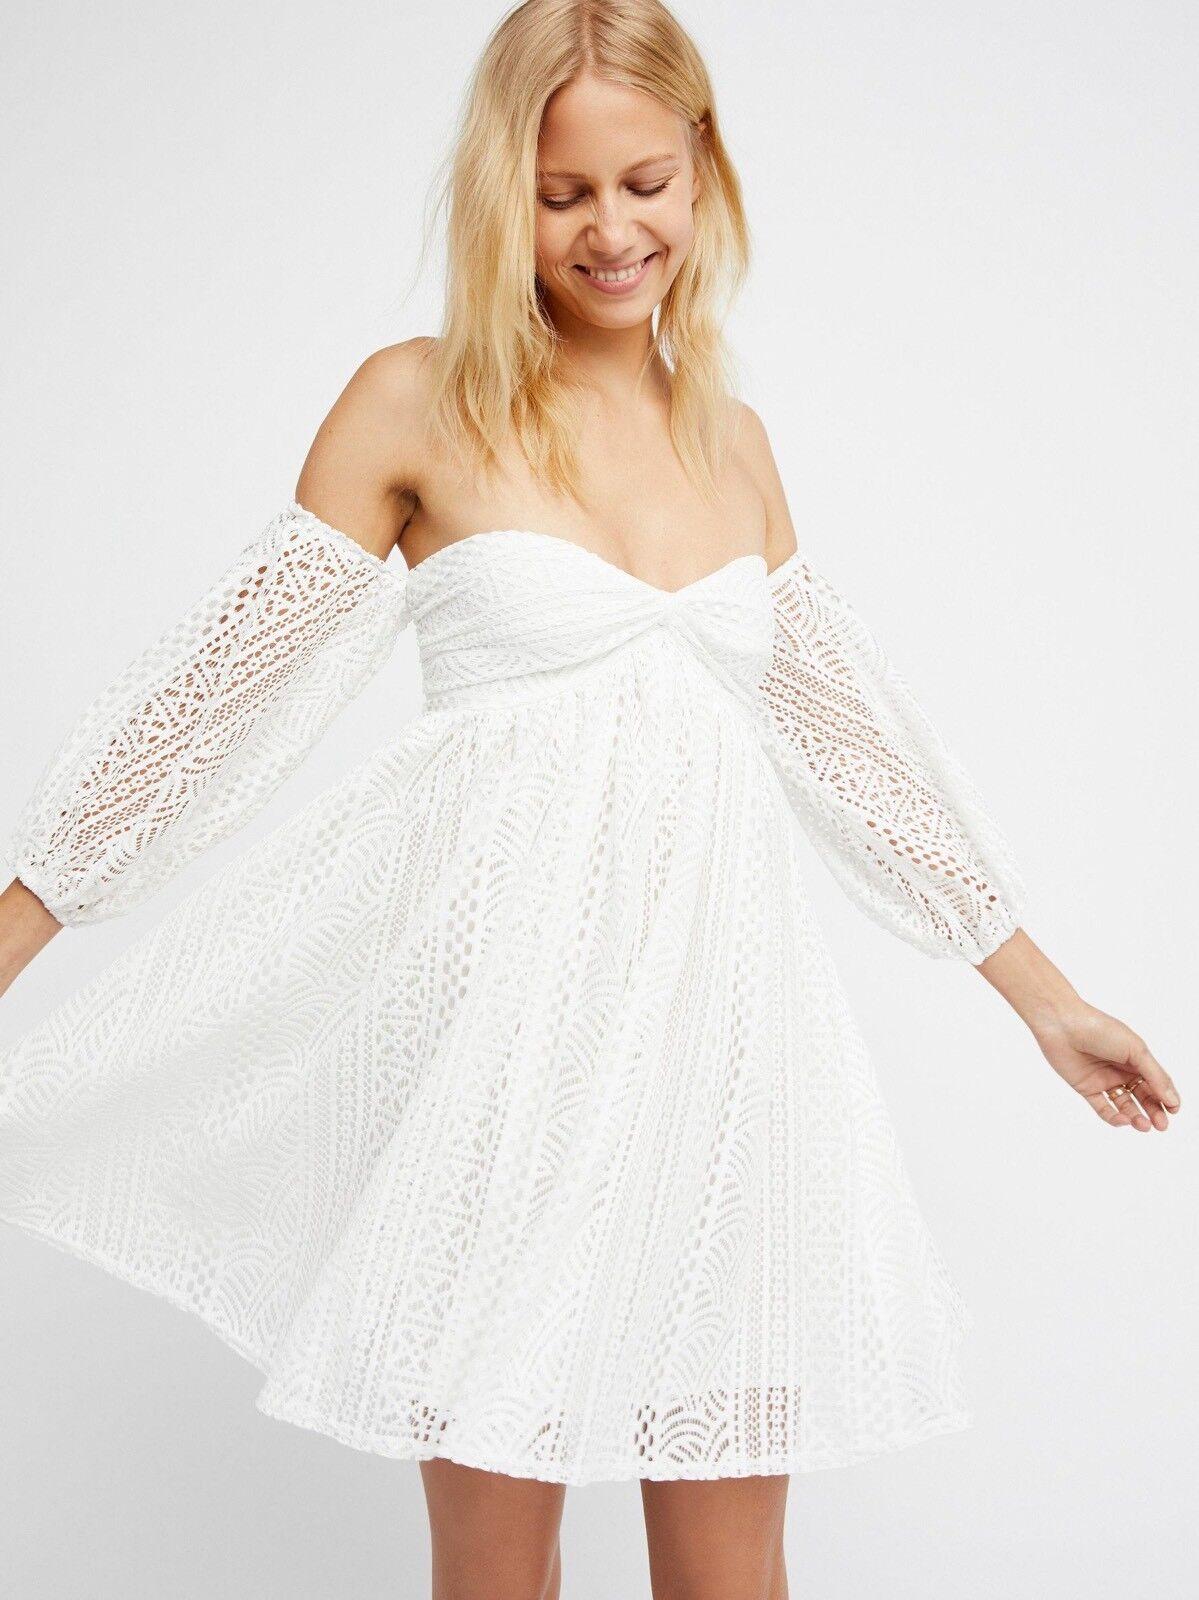 MWOT Free People Eylet Emmy Lou Mini Baby Doll Dress large